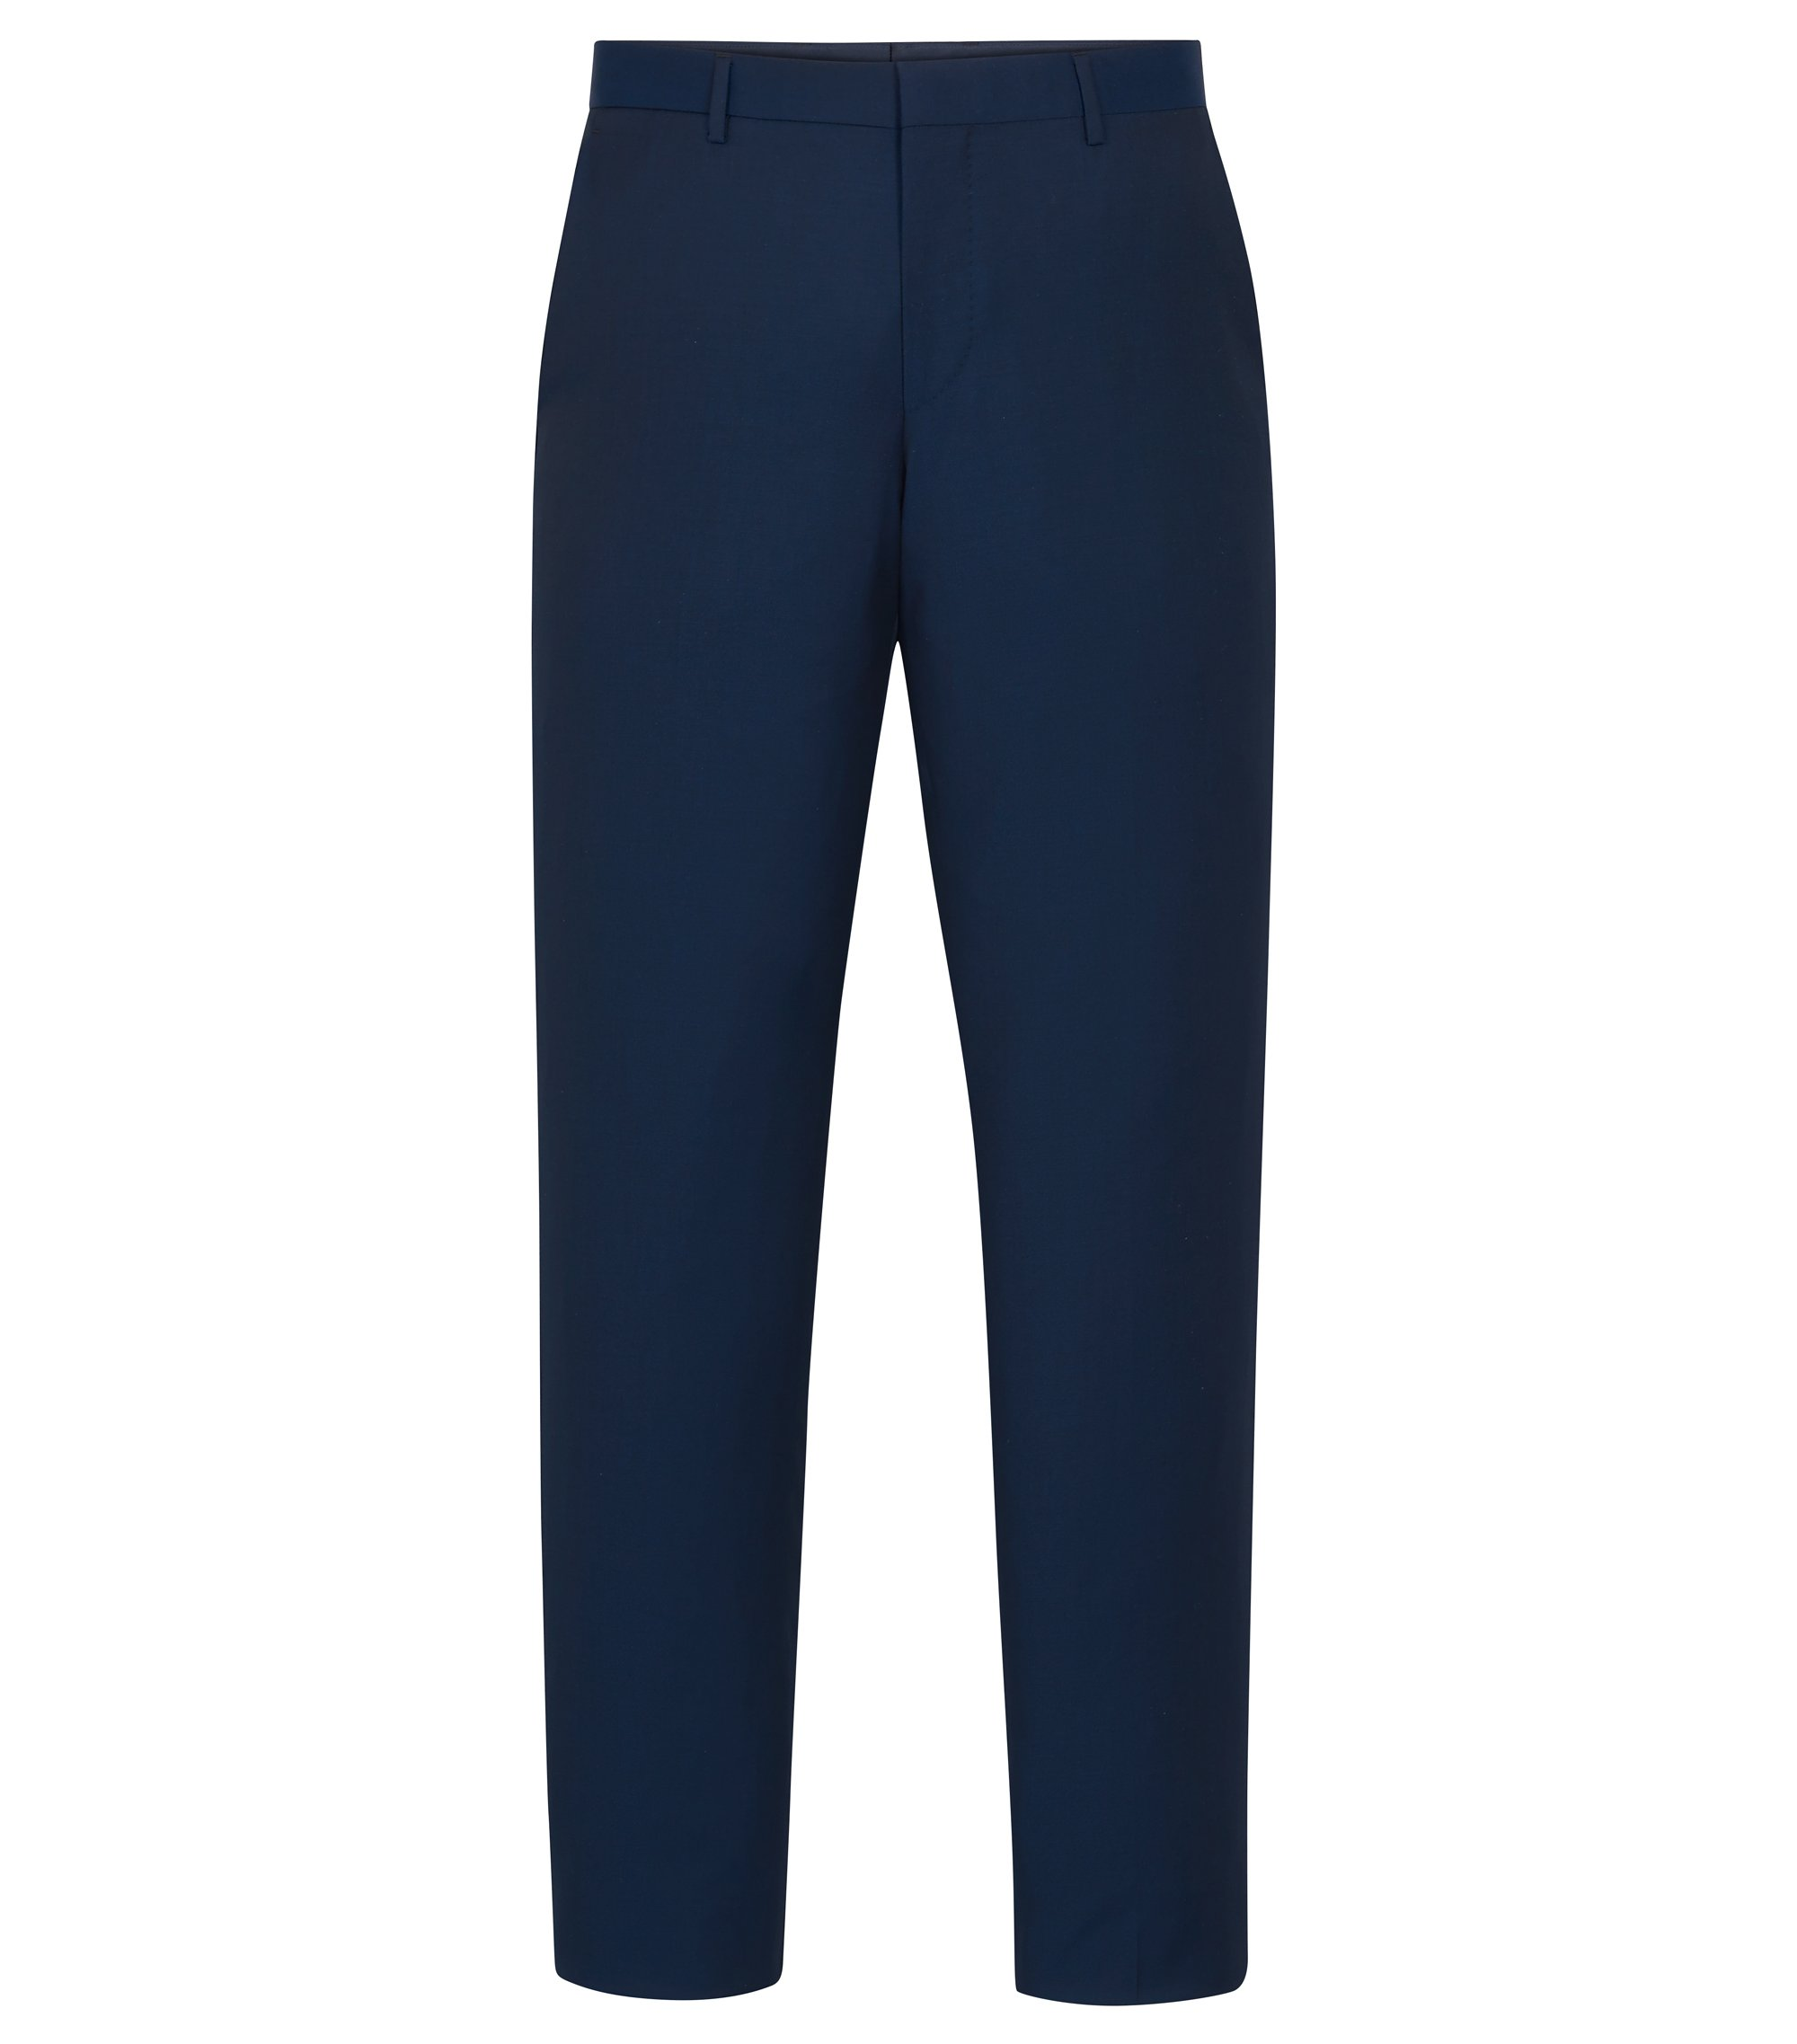 Virgin Wool Dress Pant, Slim Fit | Balte, Turquoise